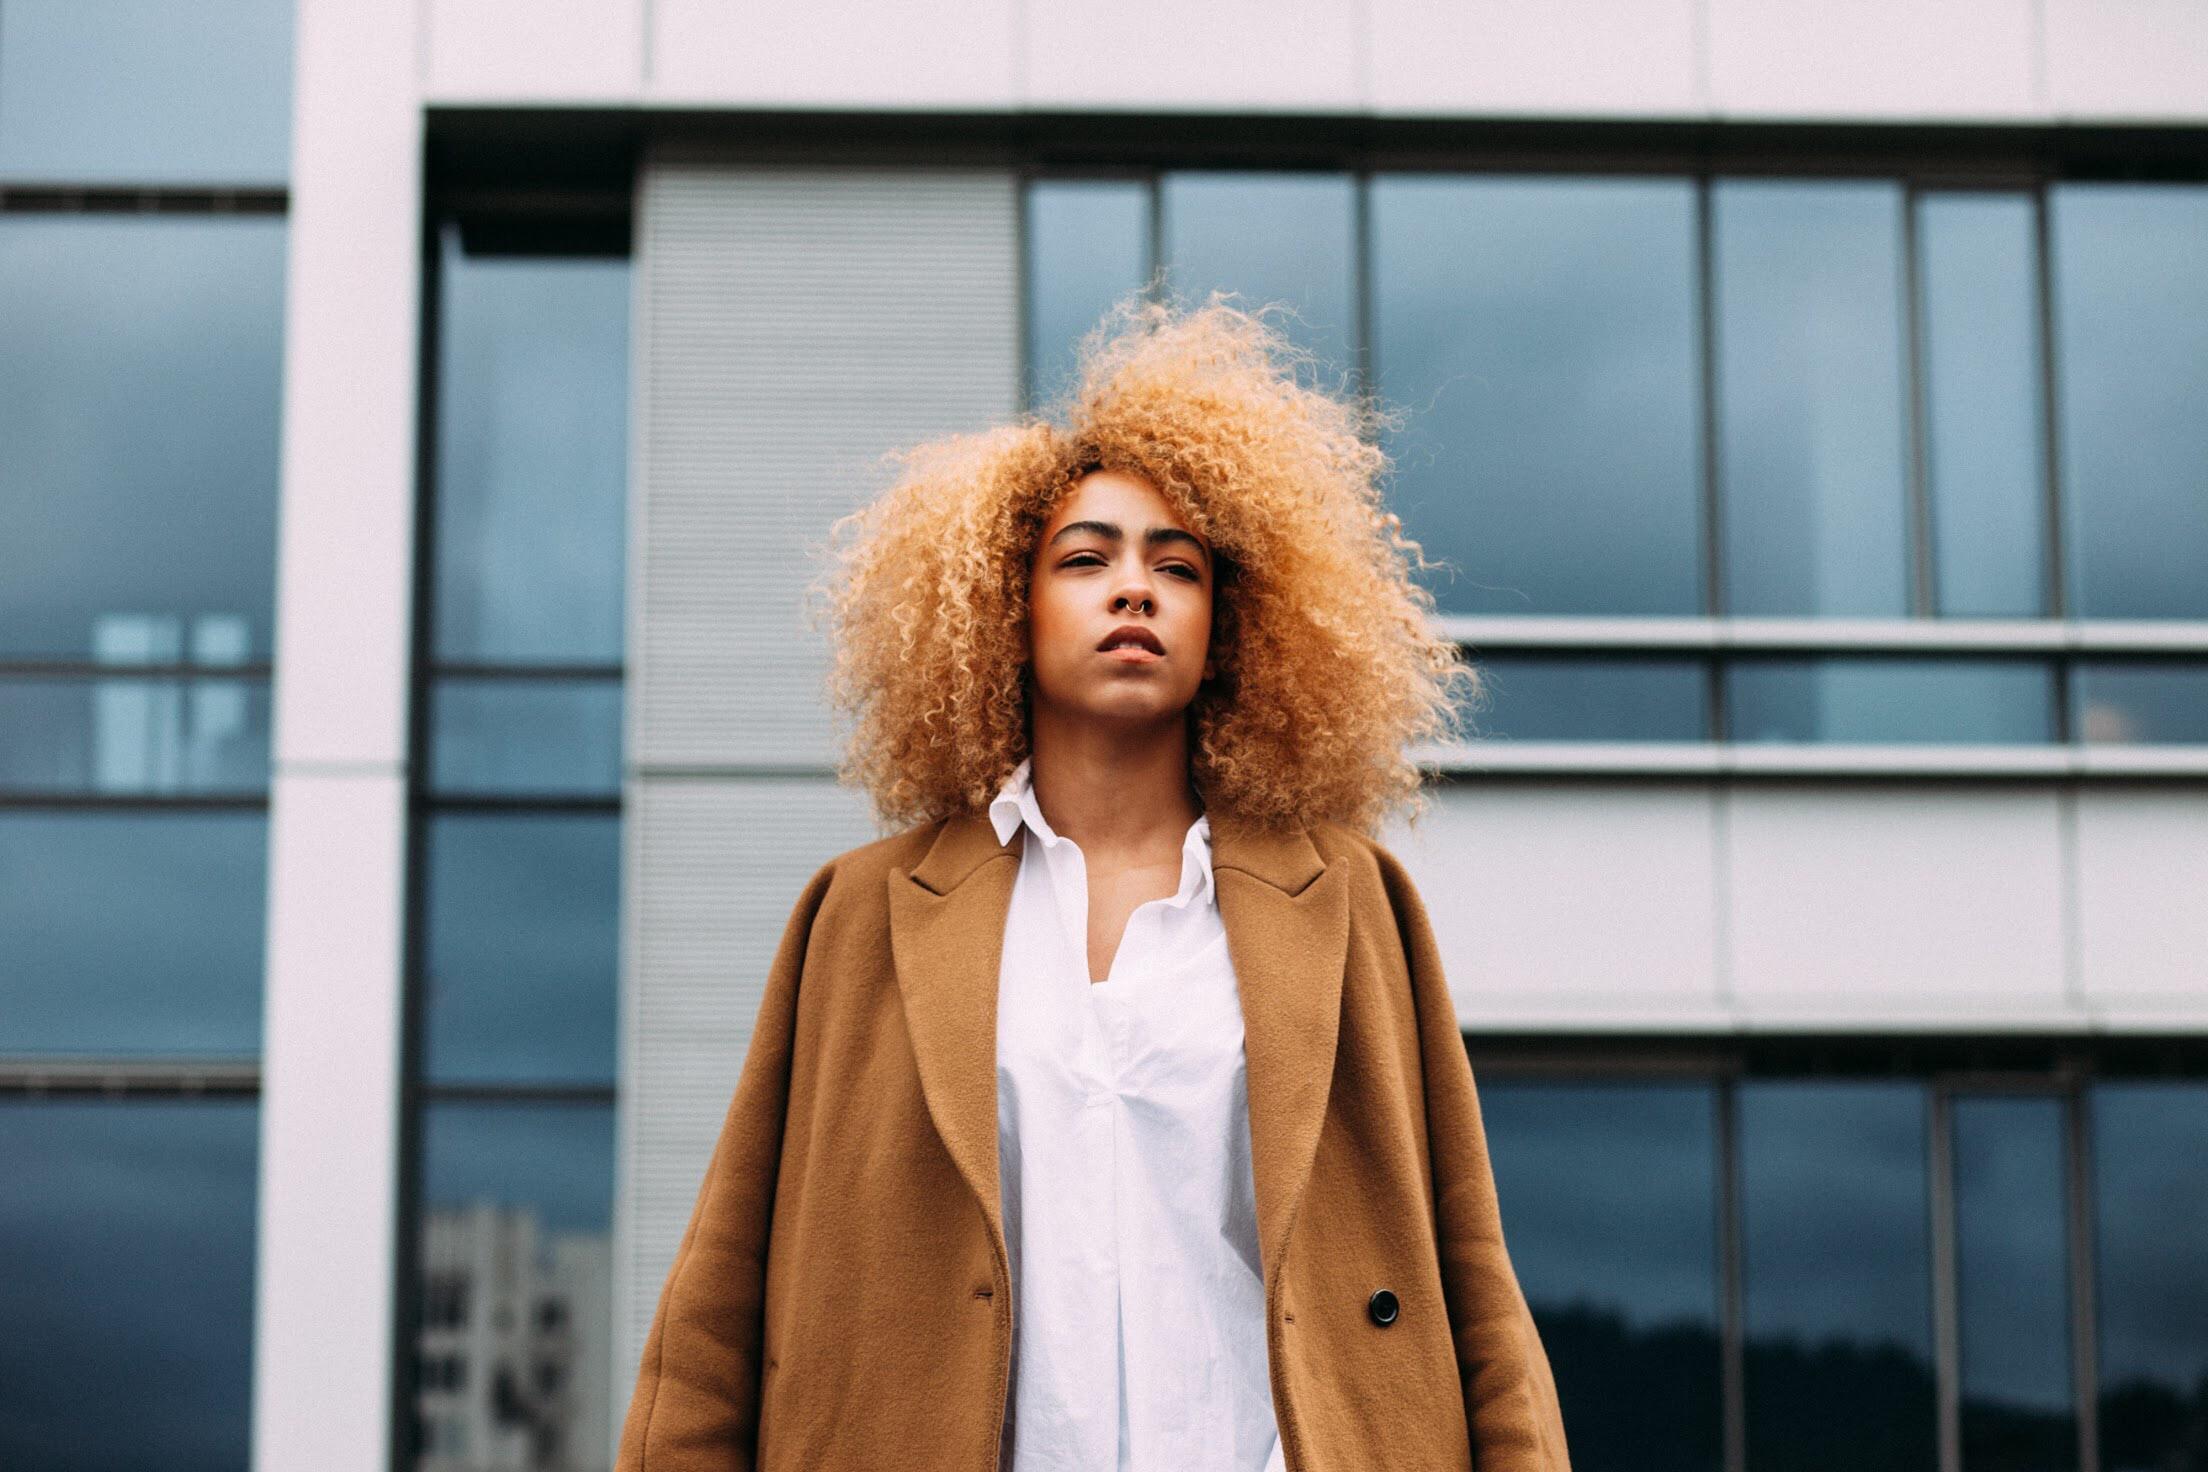 cabelo cacheado descolorido capa - 3 cuidados fundamentais para quem descoloriu os fios